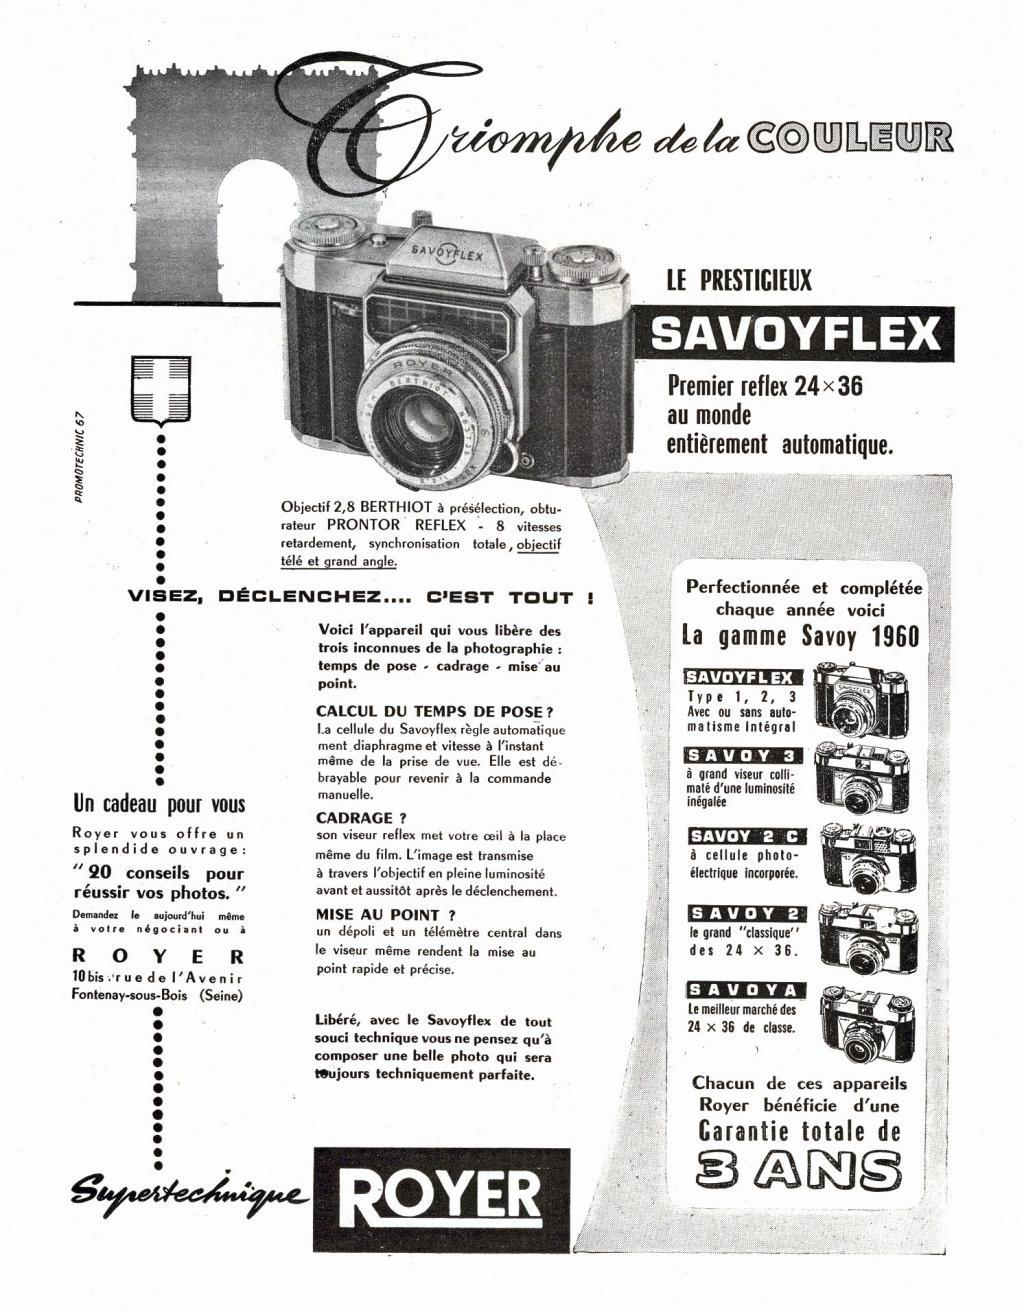 Wallpaper 1449-3  SITO de ROYER  Savoyflex type II, collection AMI Appareils photos